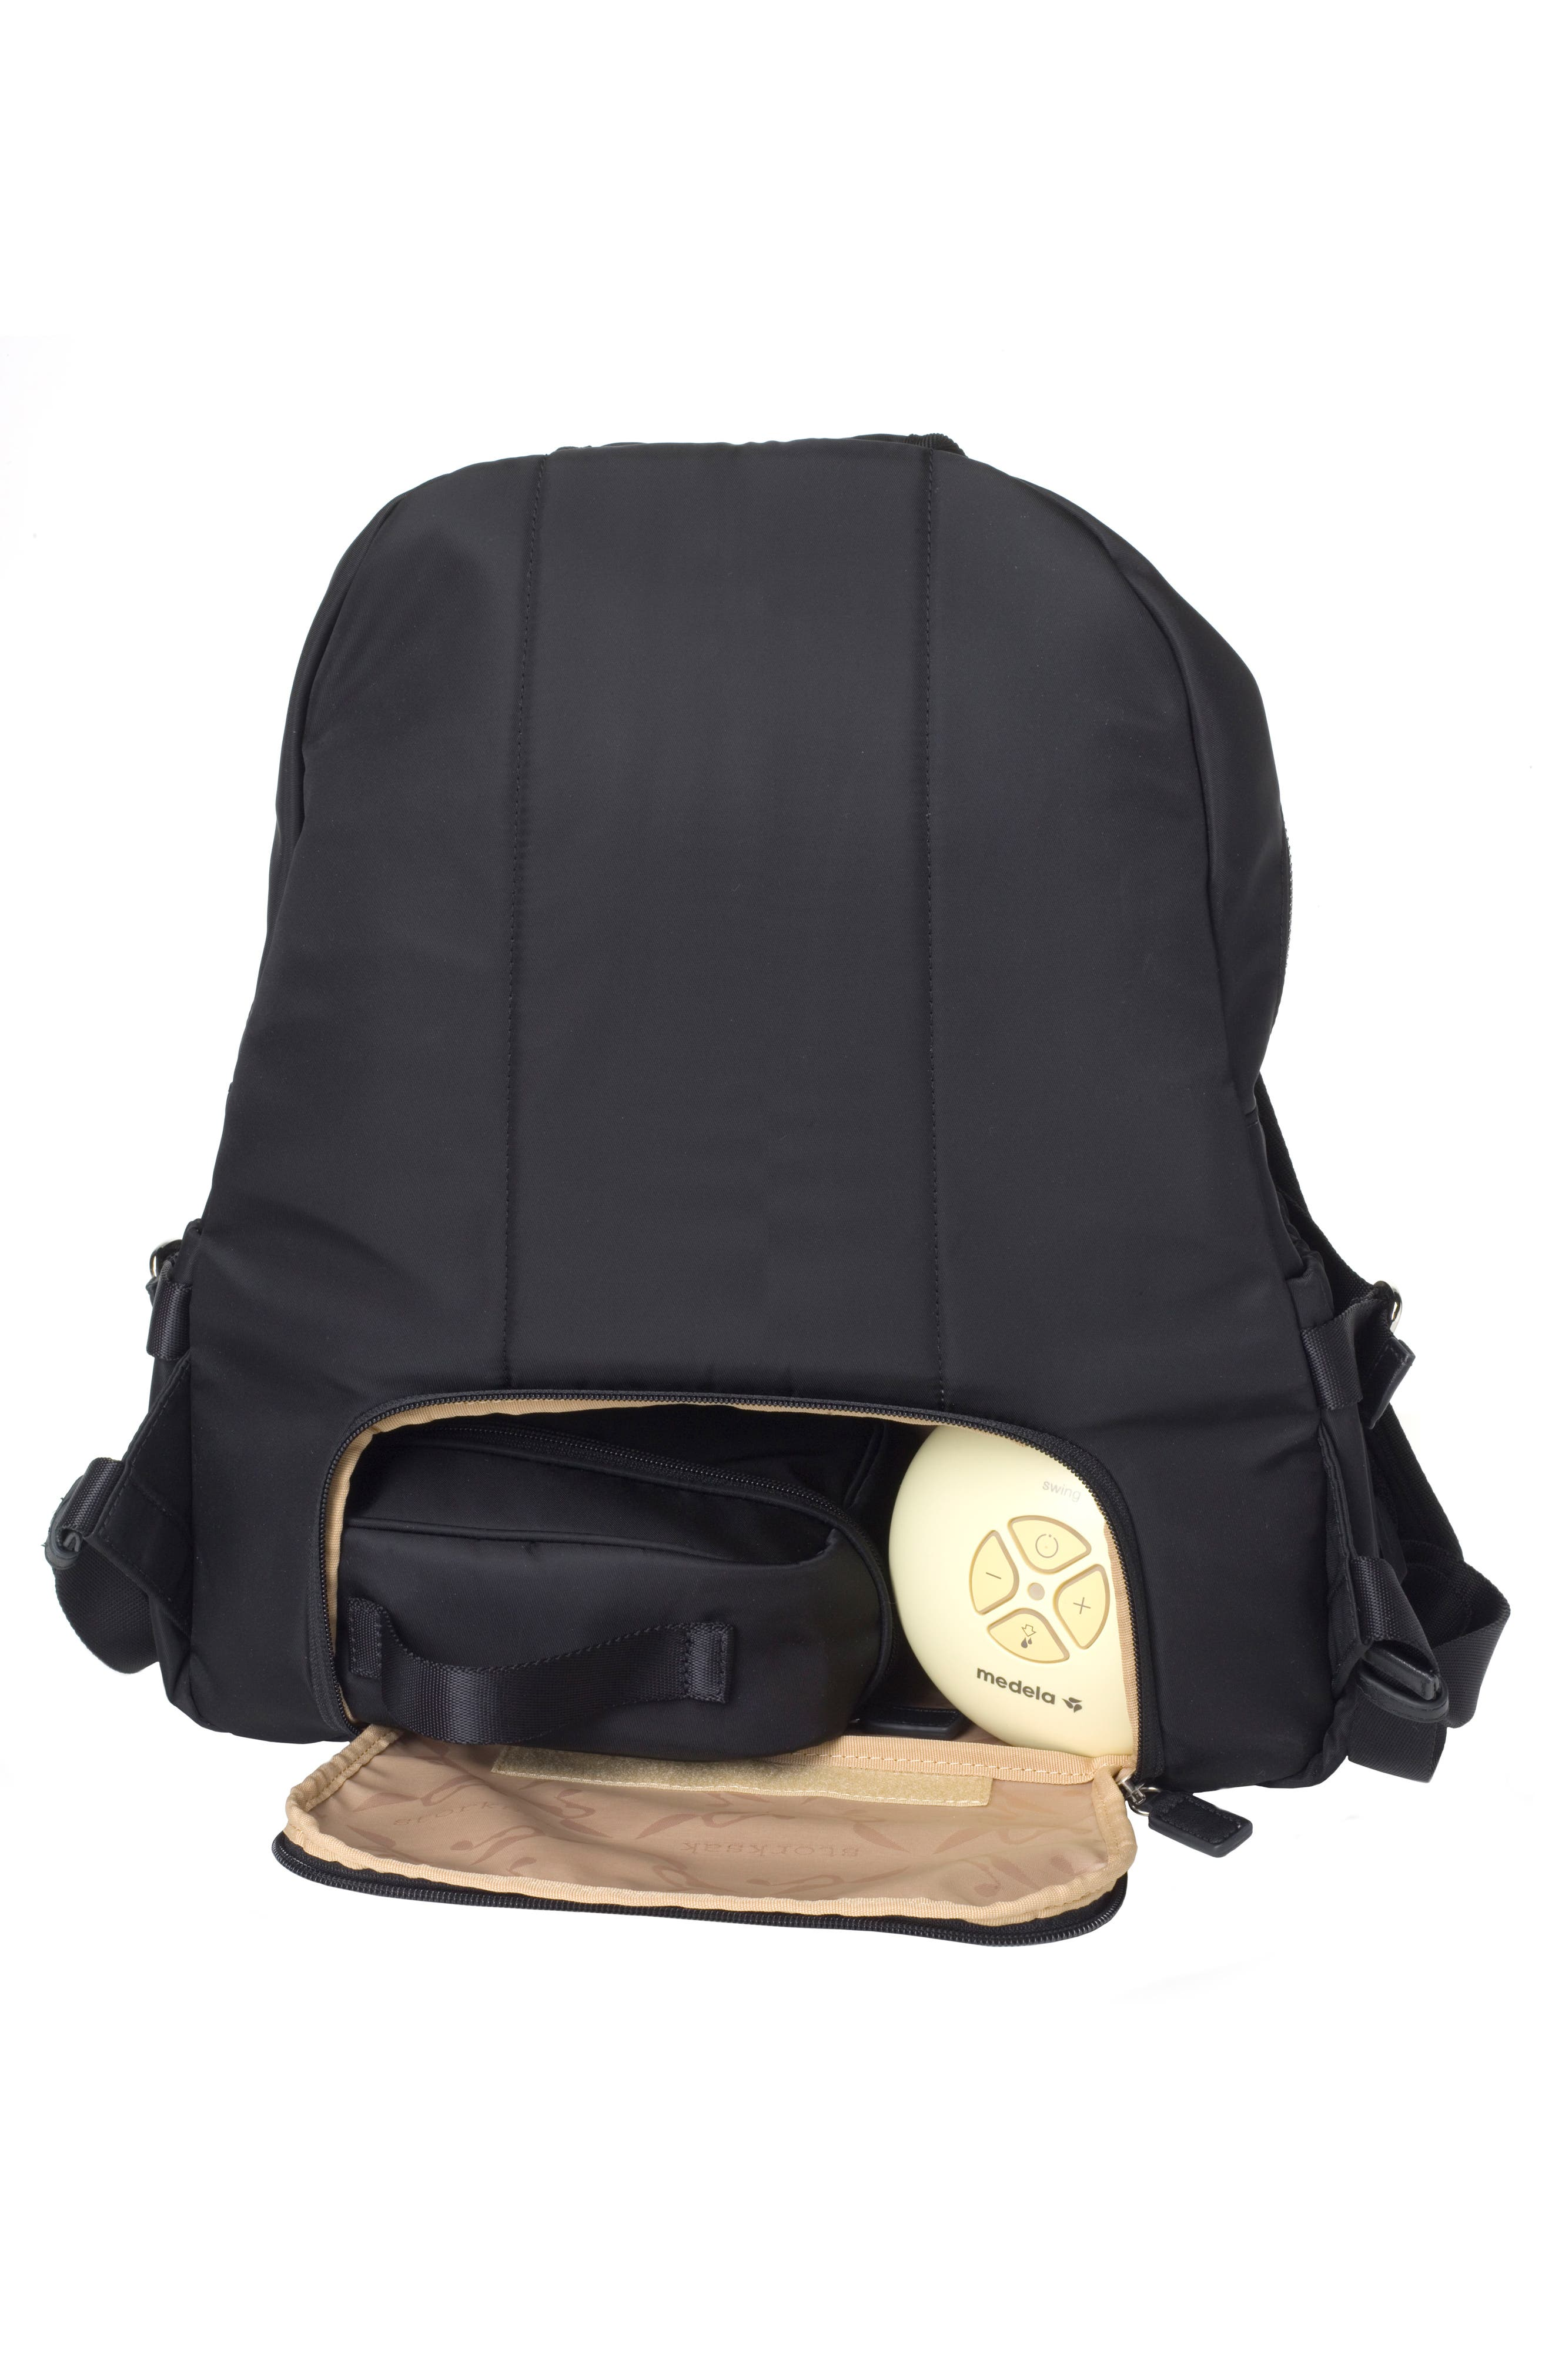 Hero Water Resistant Nylon Backpack Diaper Bag,                             Alternate thumbnail 12, color,                             BLACK